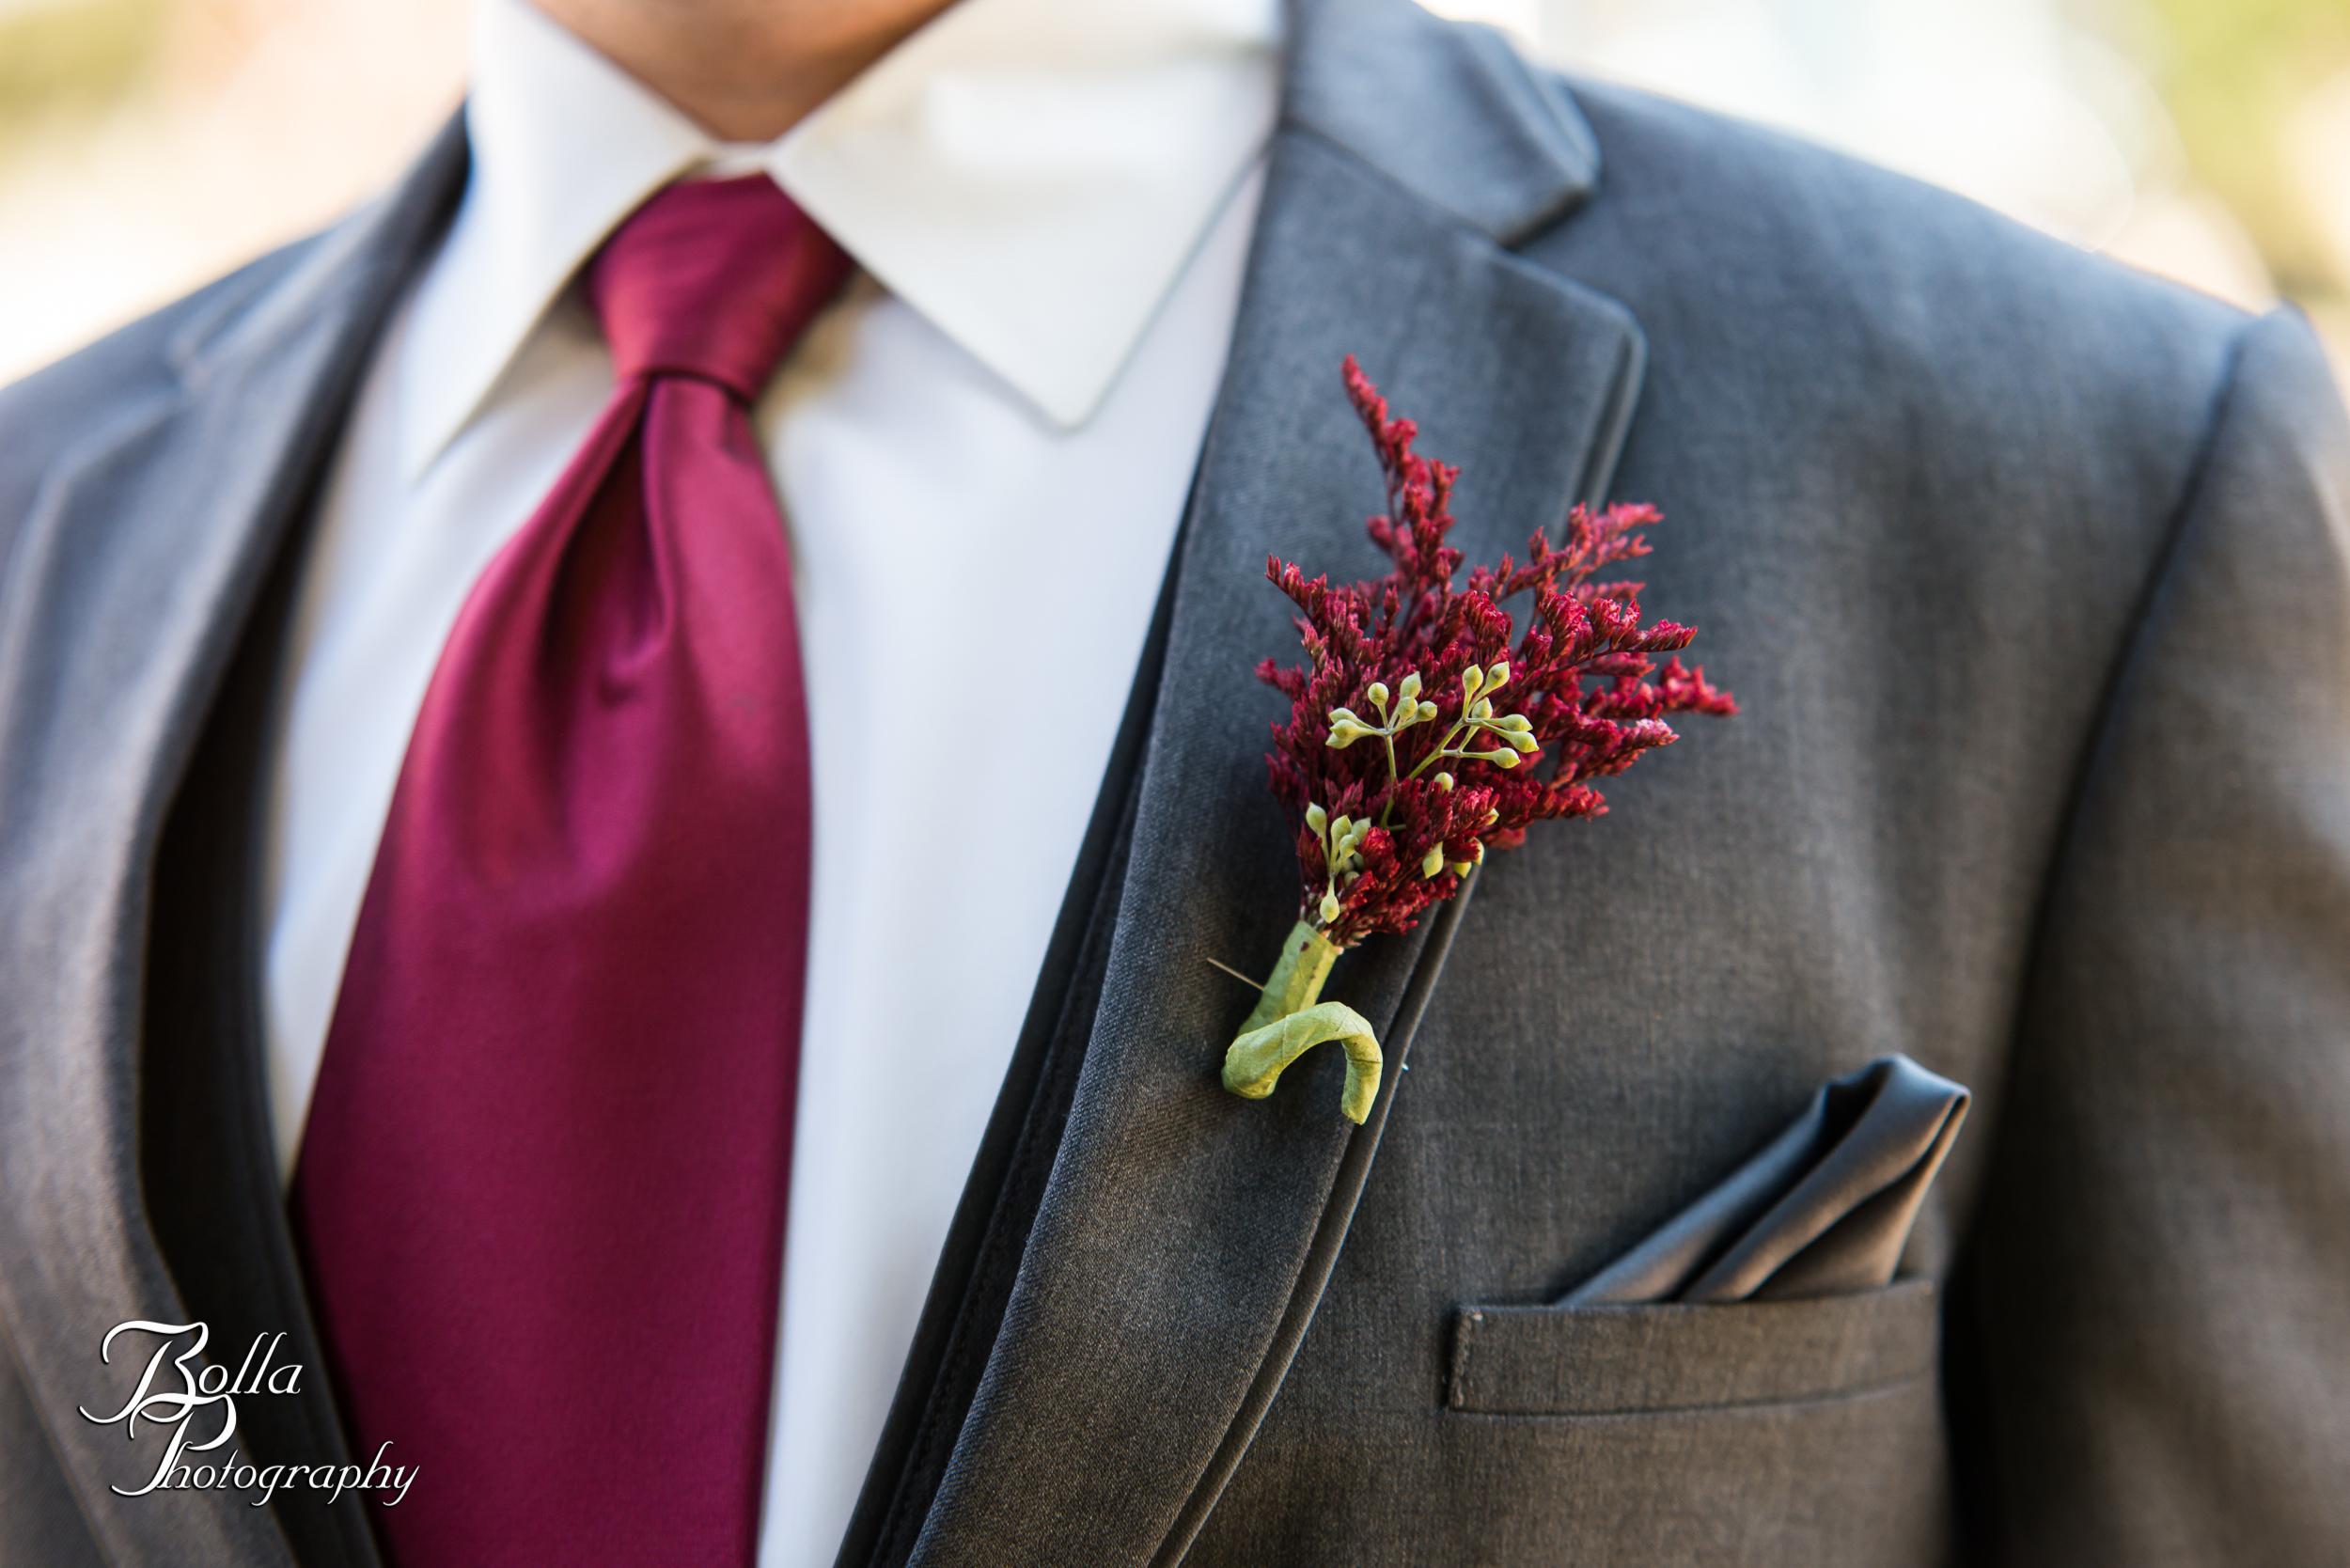 Bolla_photography_edwardsville_wedding_photographer_st_louis_weddings_Reilmann-0327.jpg